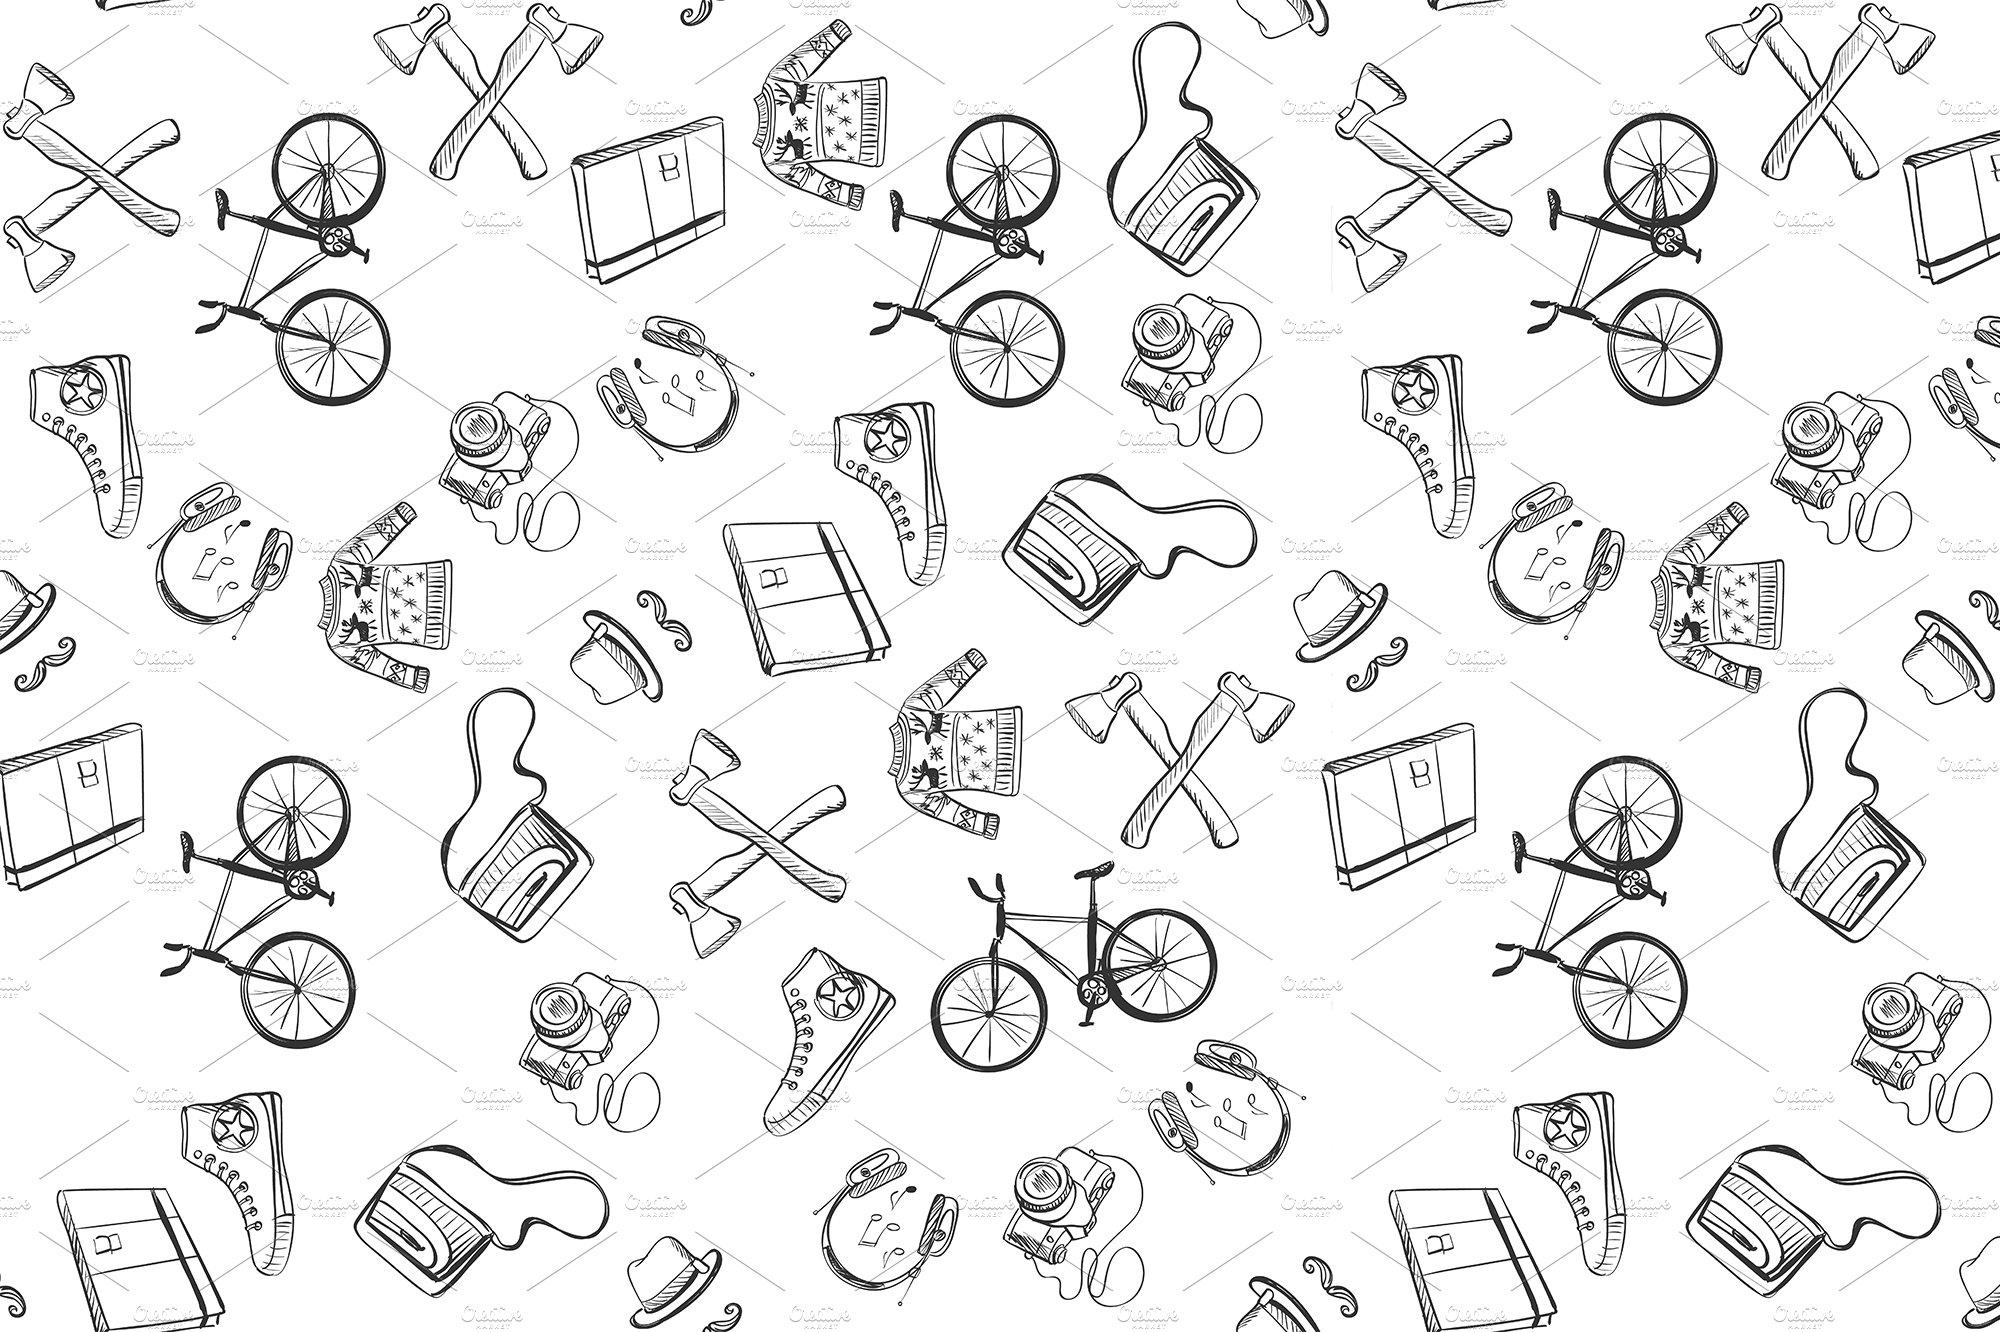 hand-drawn Hipster style pattern ~ Patterns ~ Creative Market